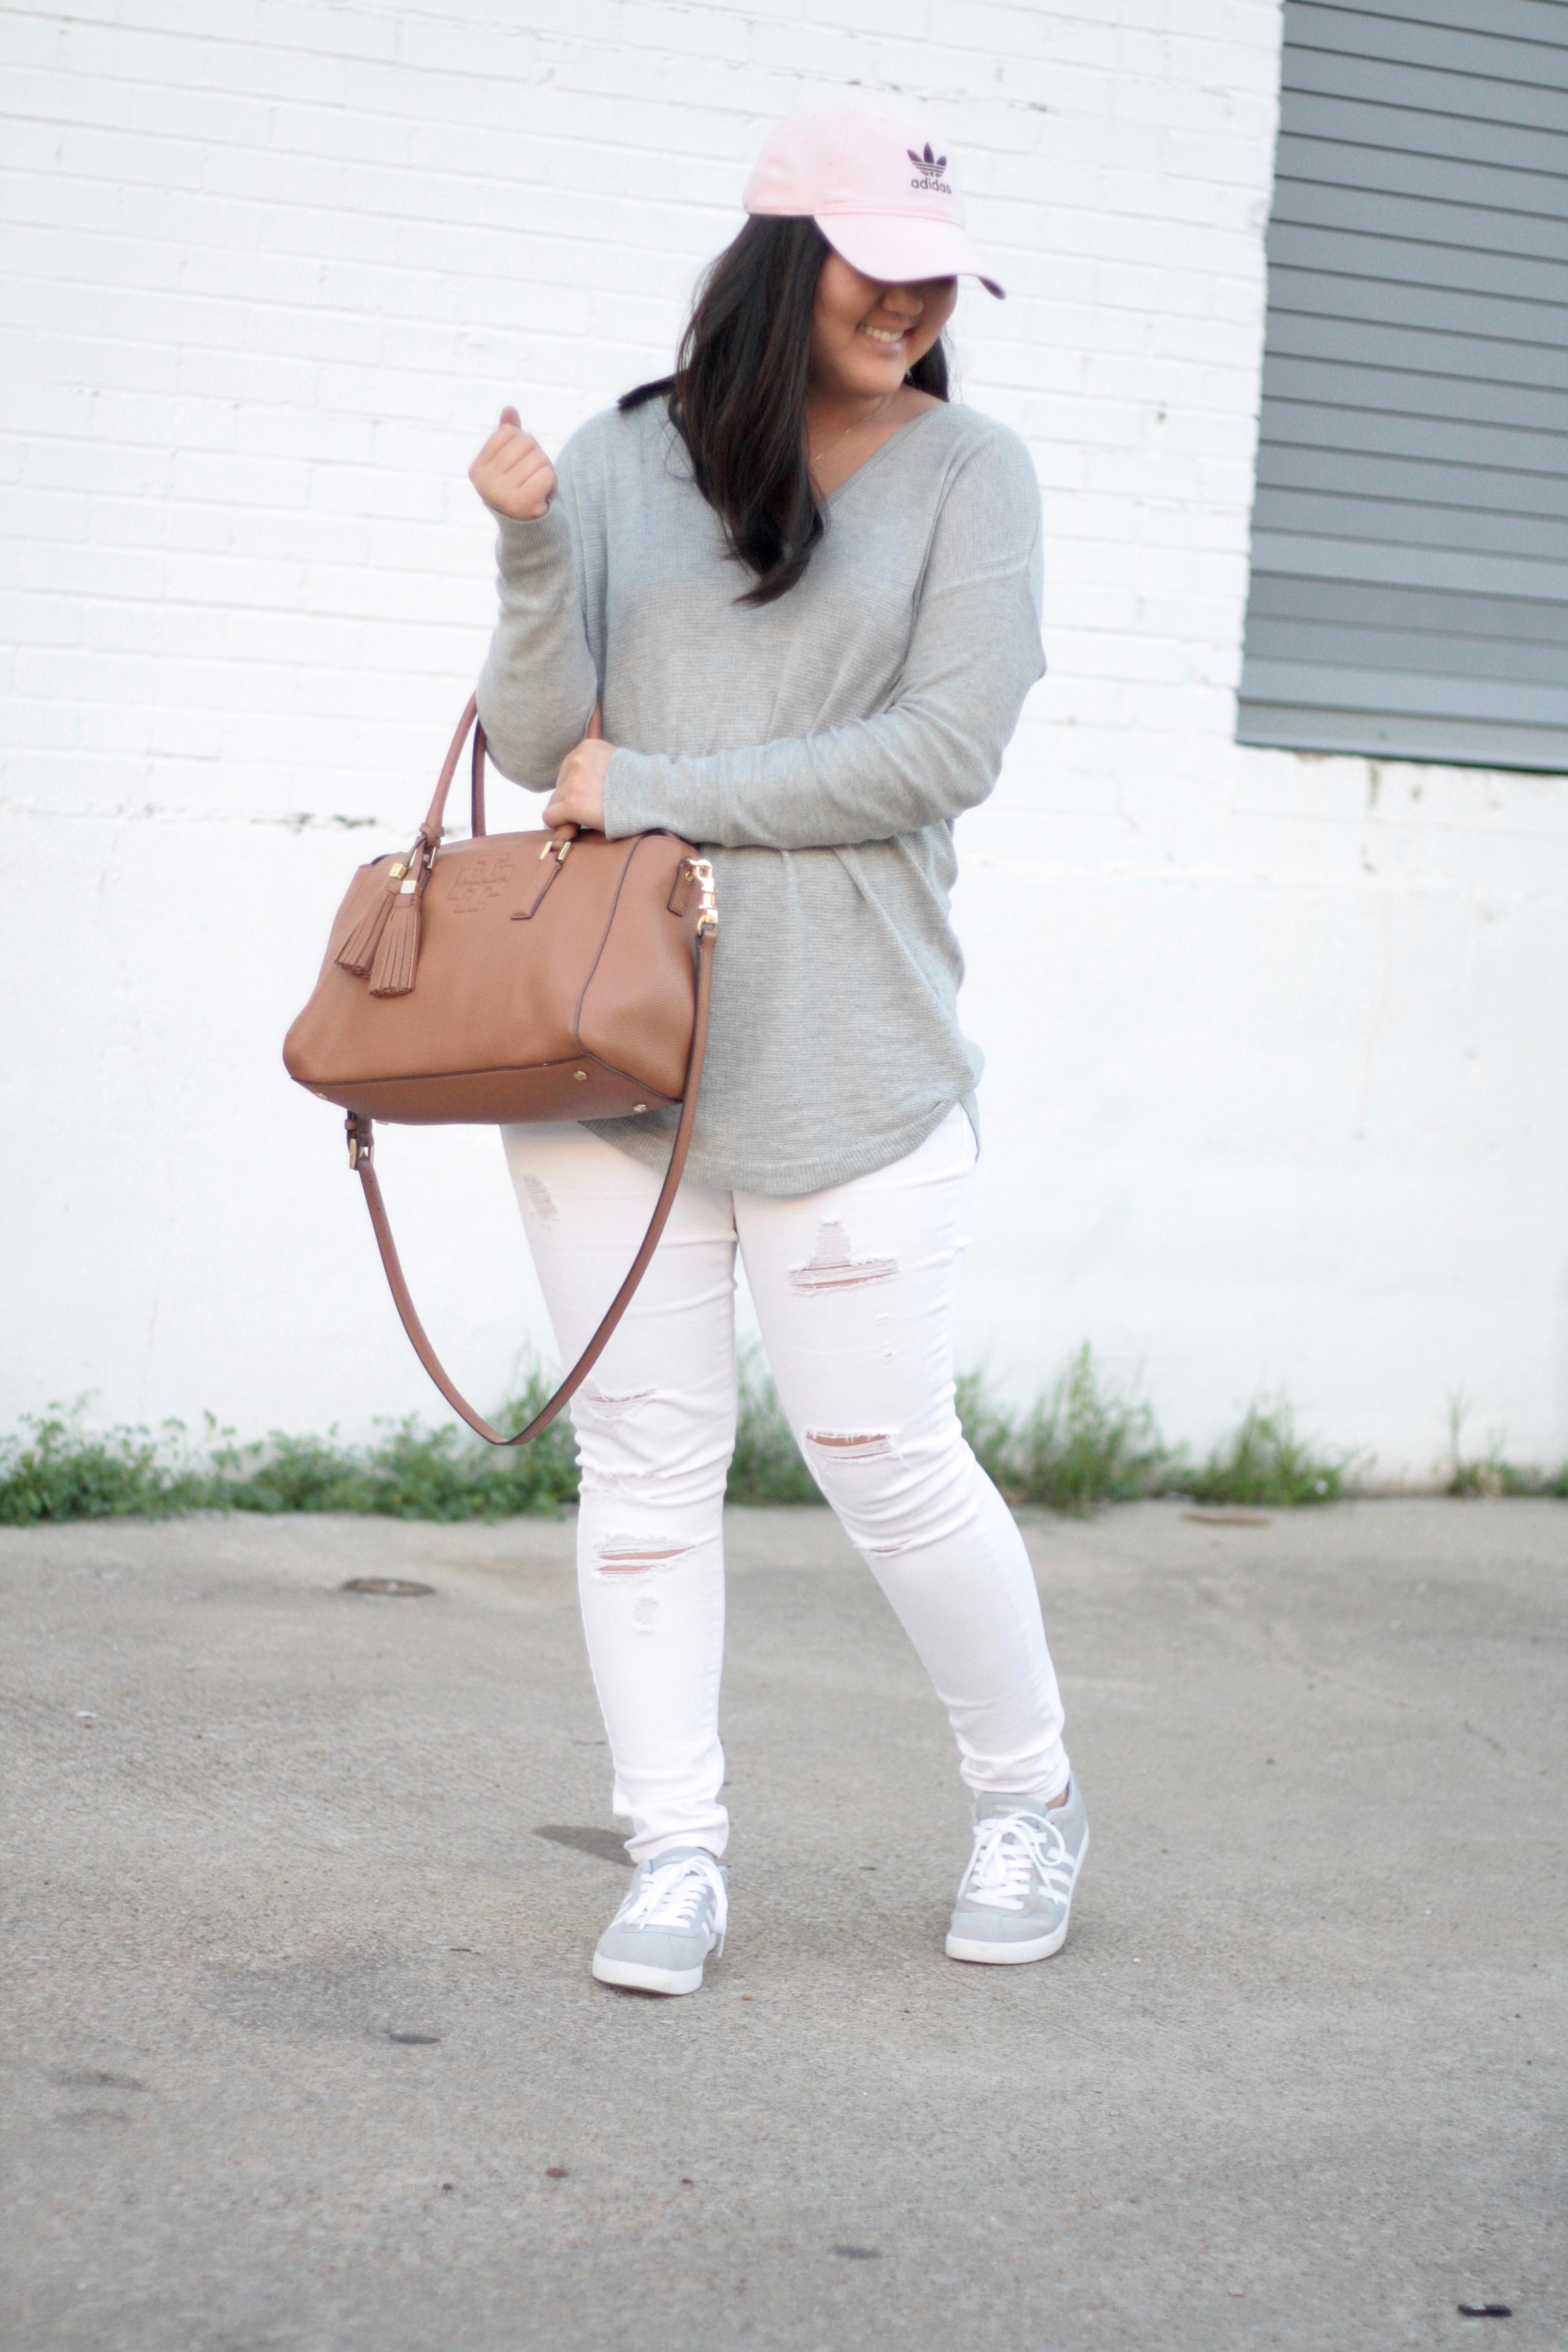 Adidas Sneaker Style